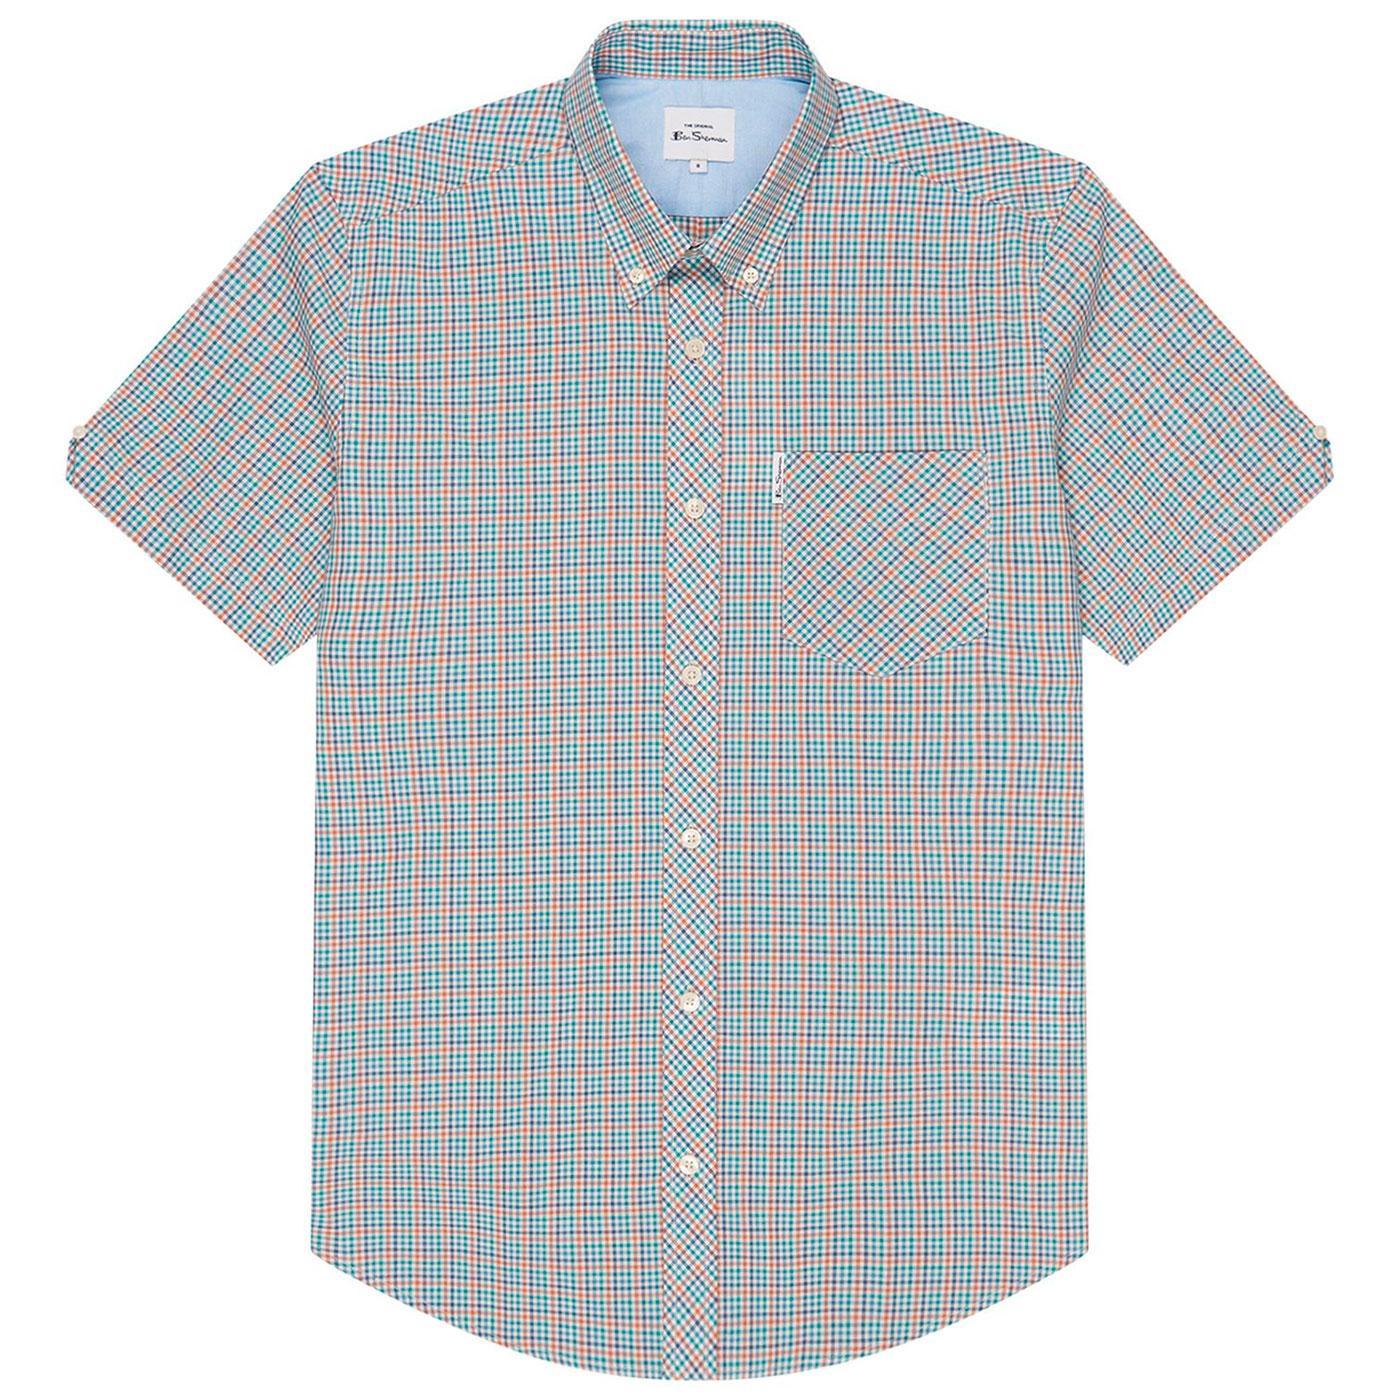 BEN SHERMAN Retro Mod Mini Gingham Check Shirt L